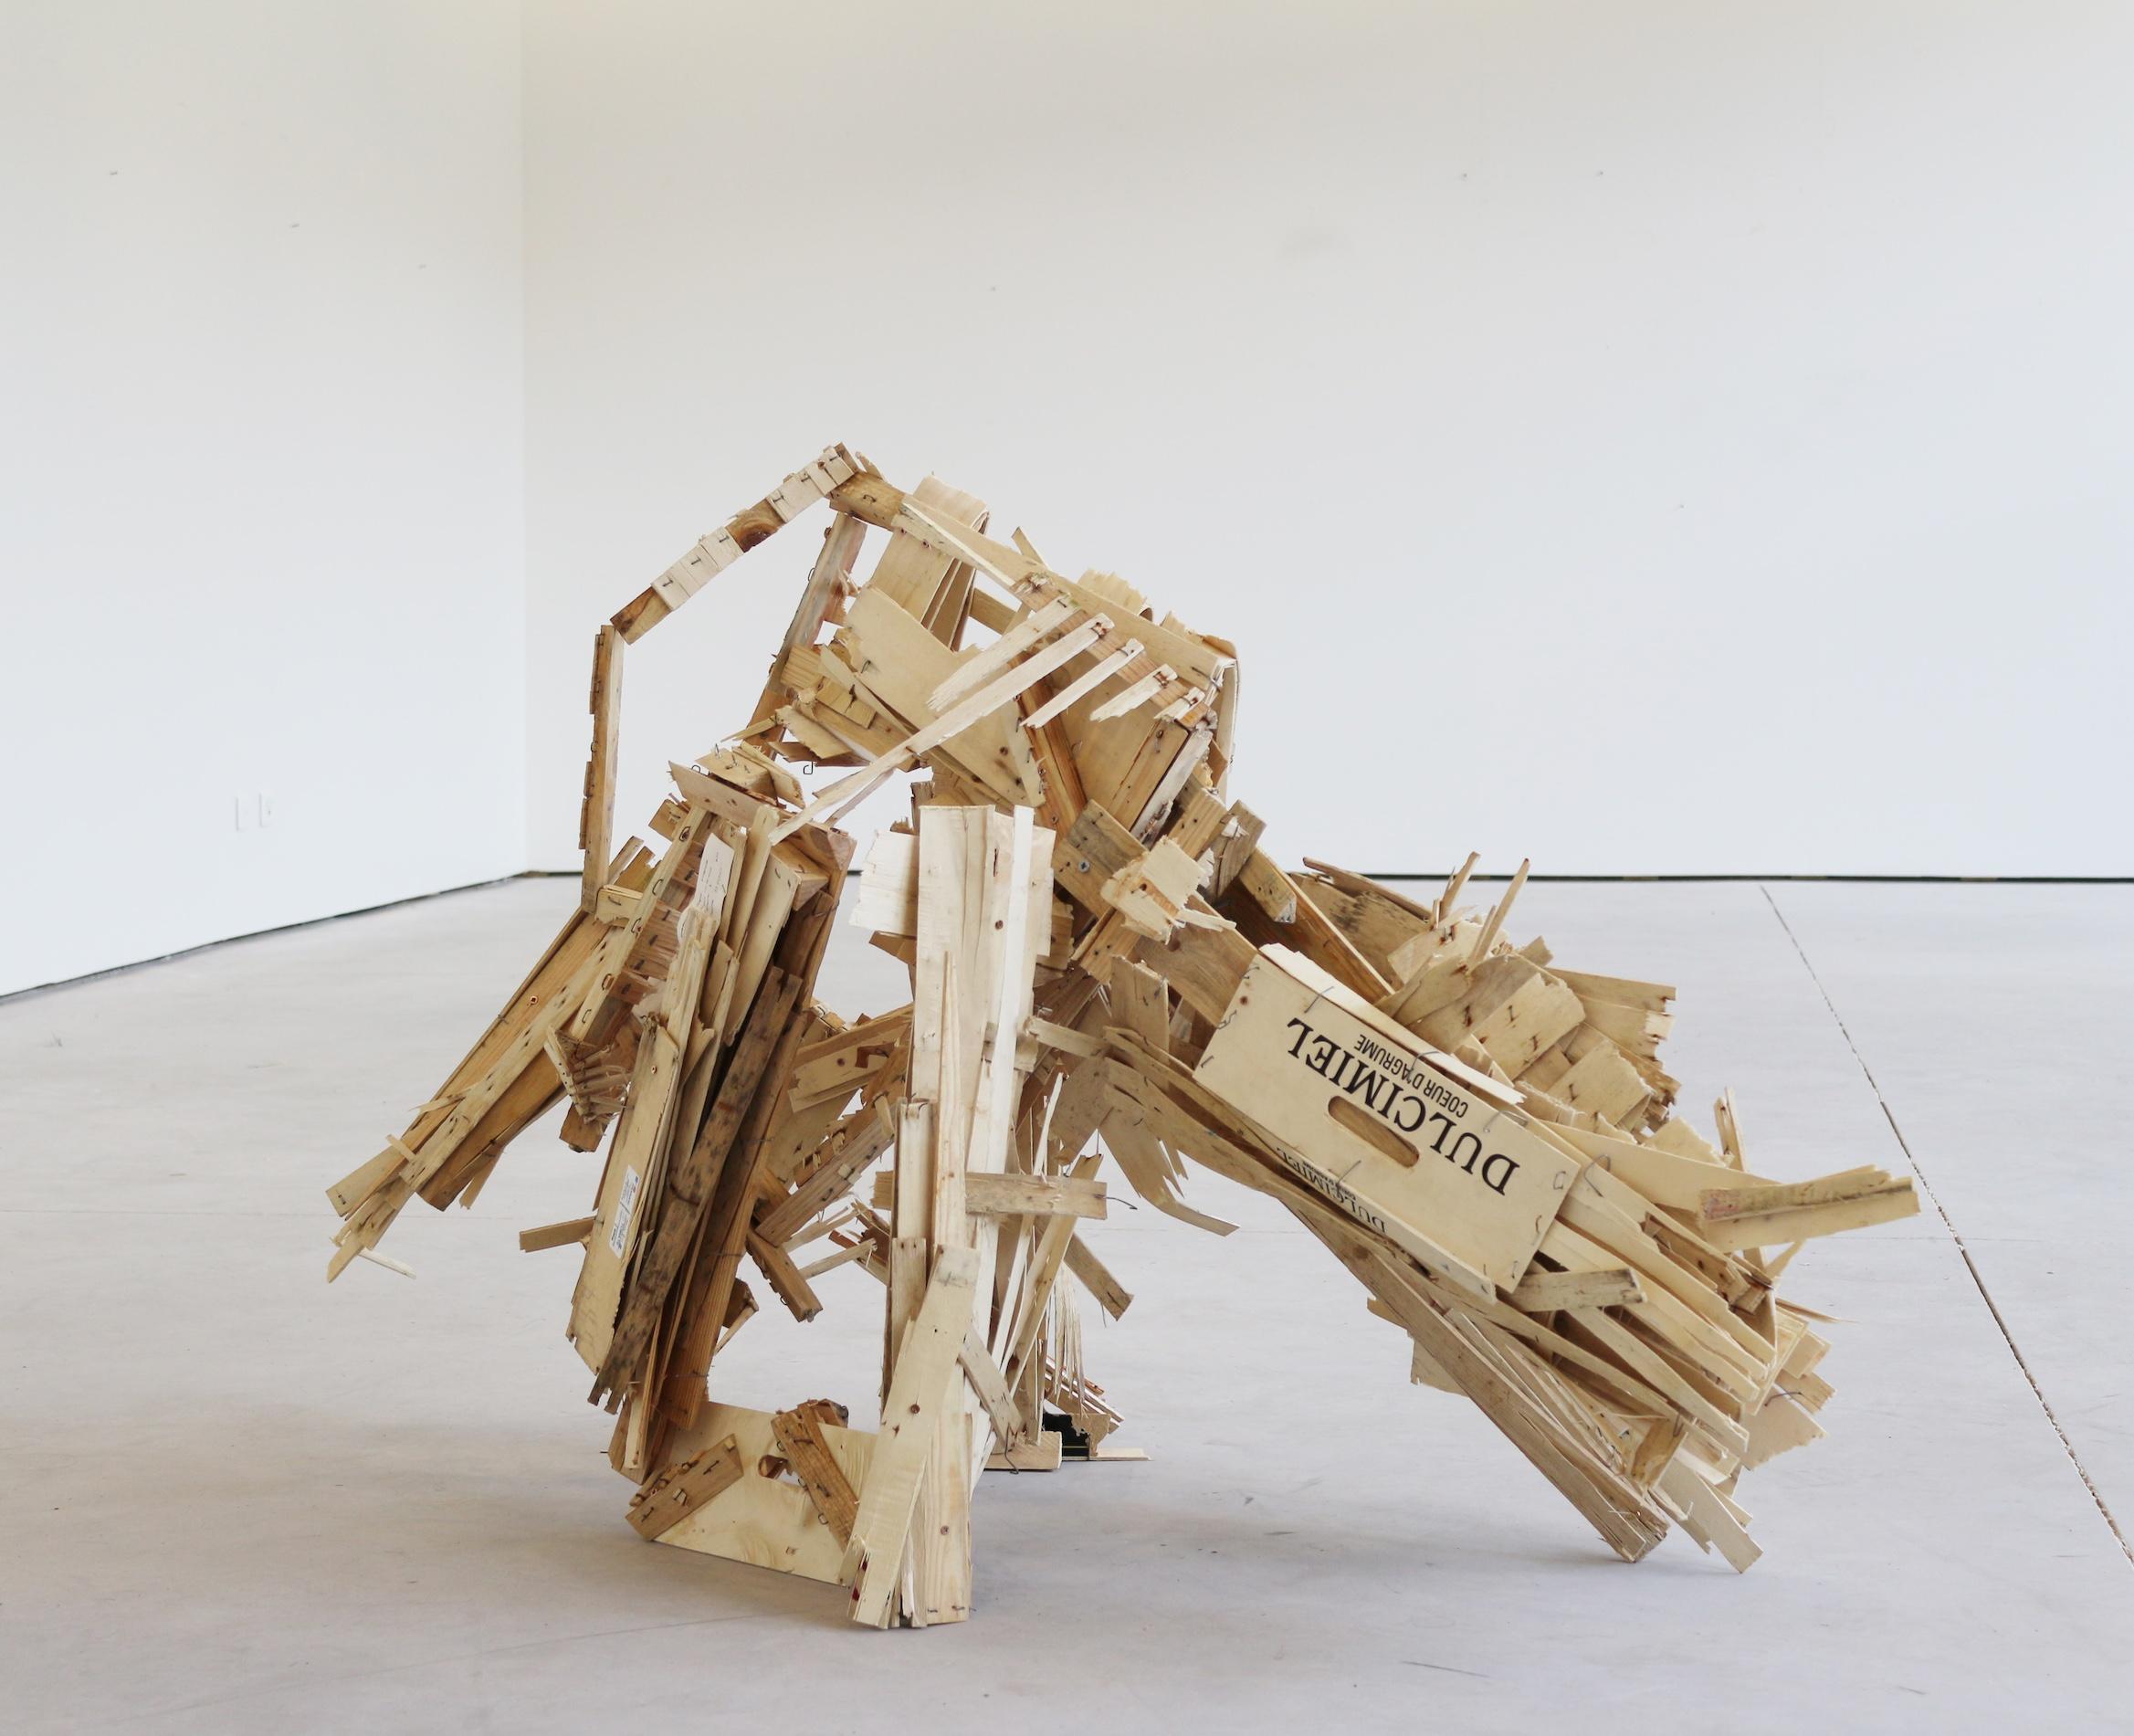 2020_Felix Becker_untitled_2020_wood_145 x 90 x 55 cm_web